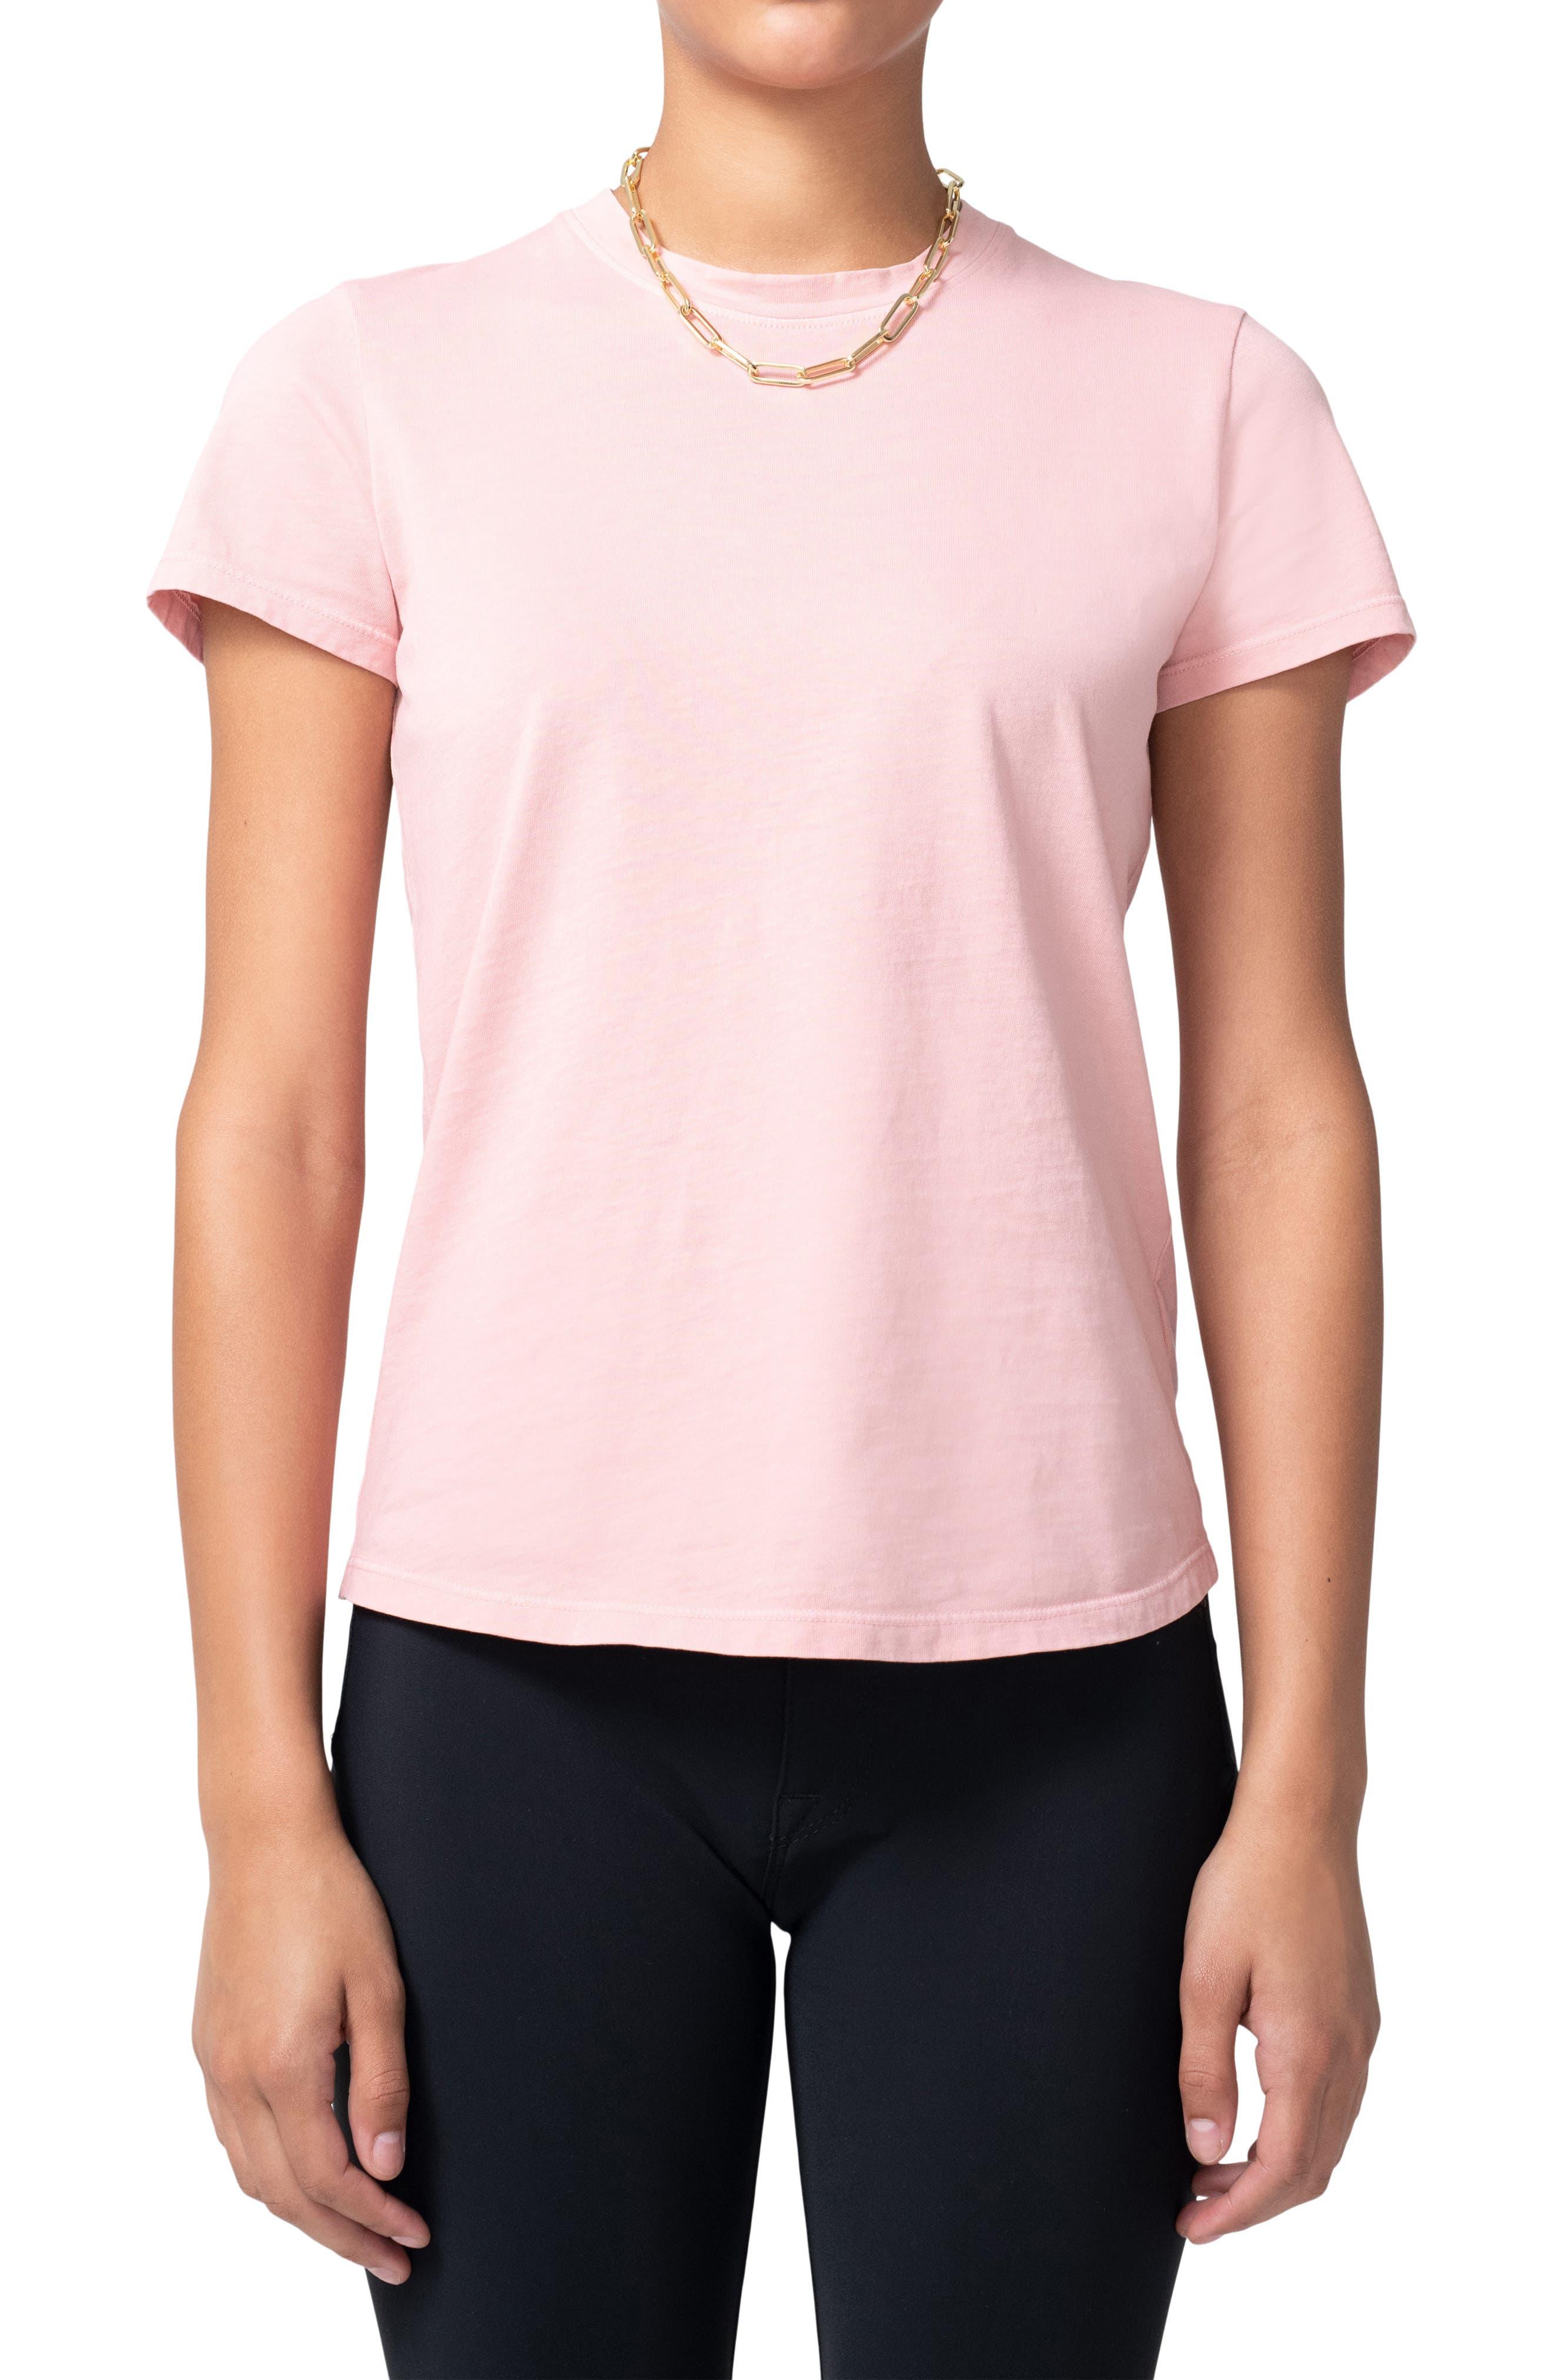 Heart On My Sleeve Organic Cotton T-Shirt